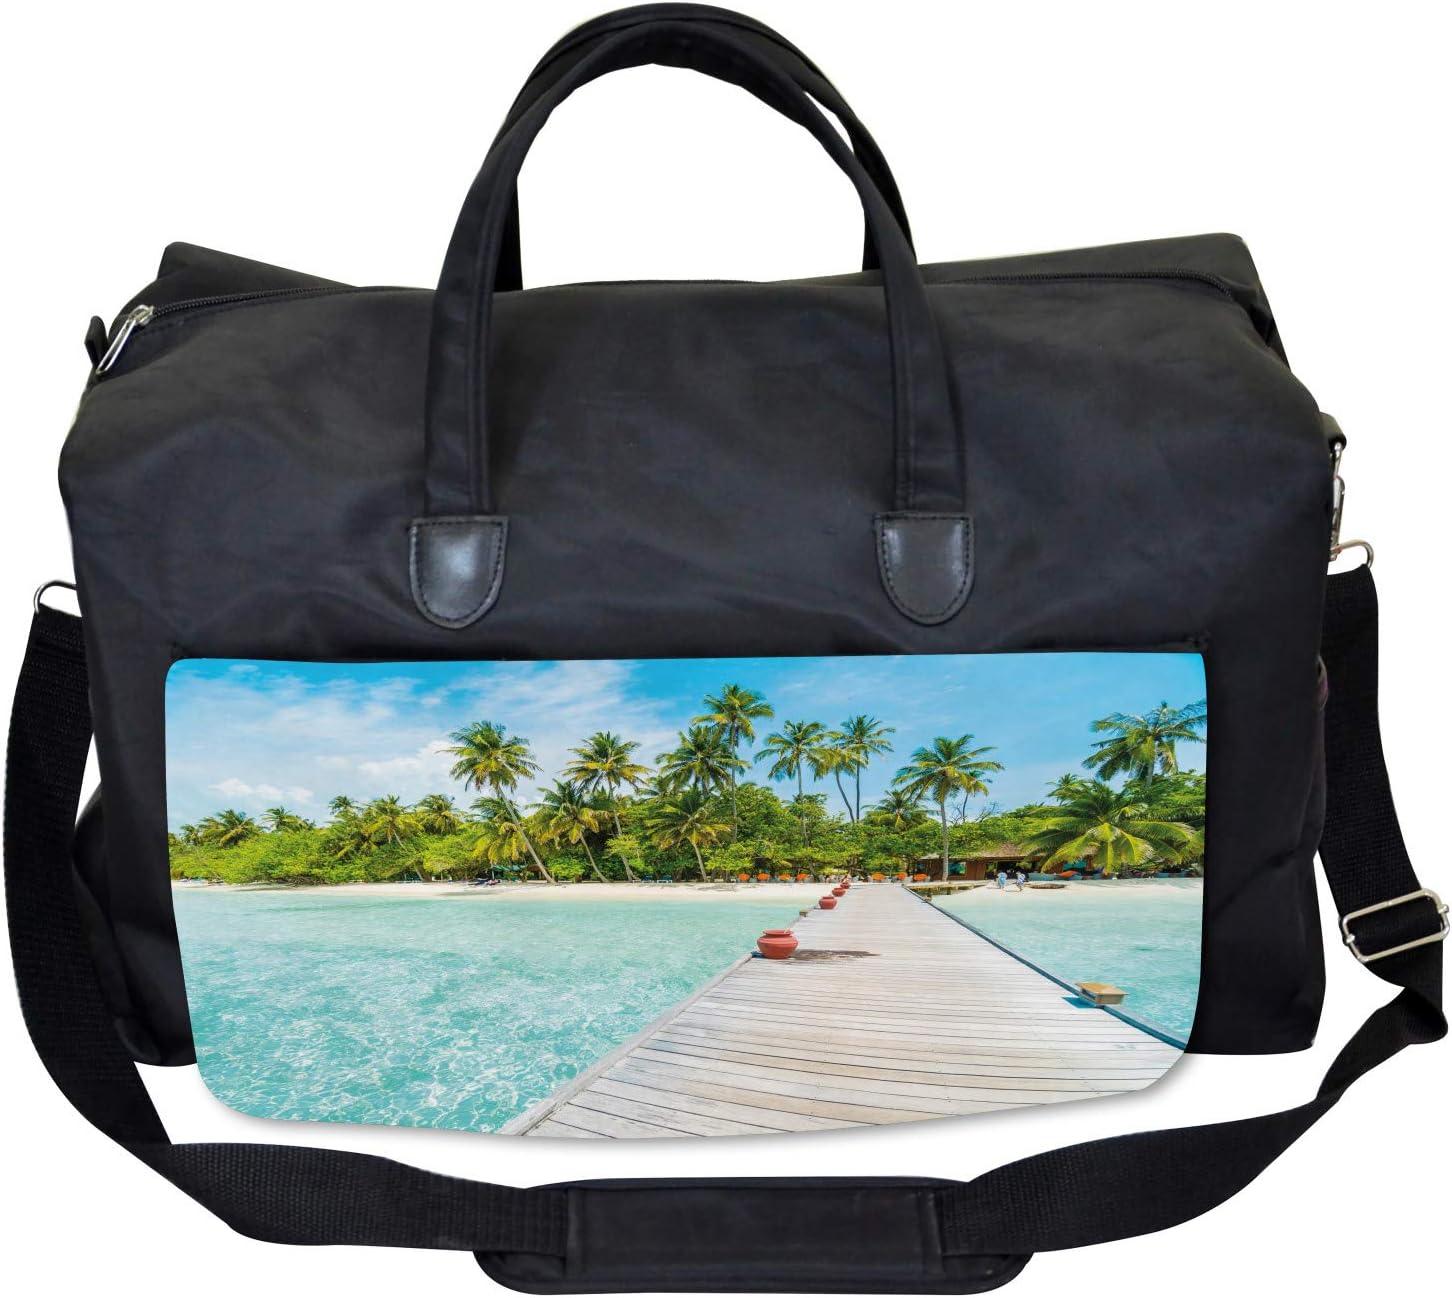 Large Weekender Carry-on Maldives Island Beach Ambesonne Tropical Gym Bag